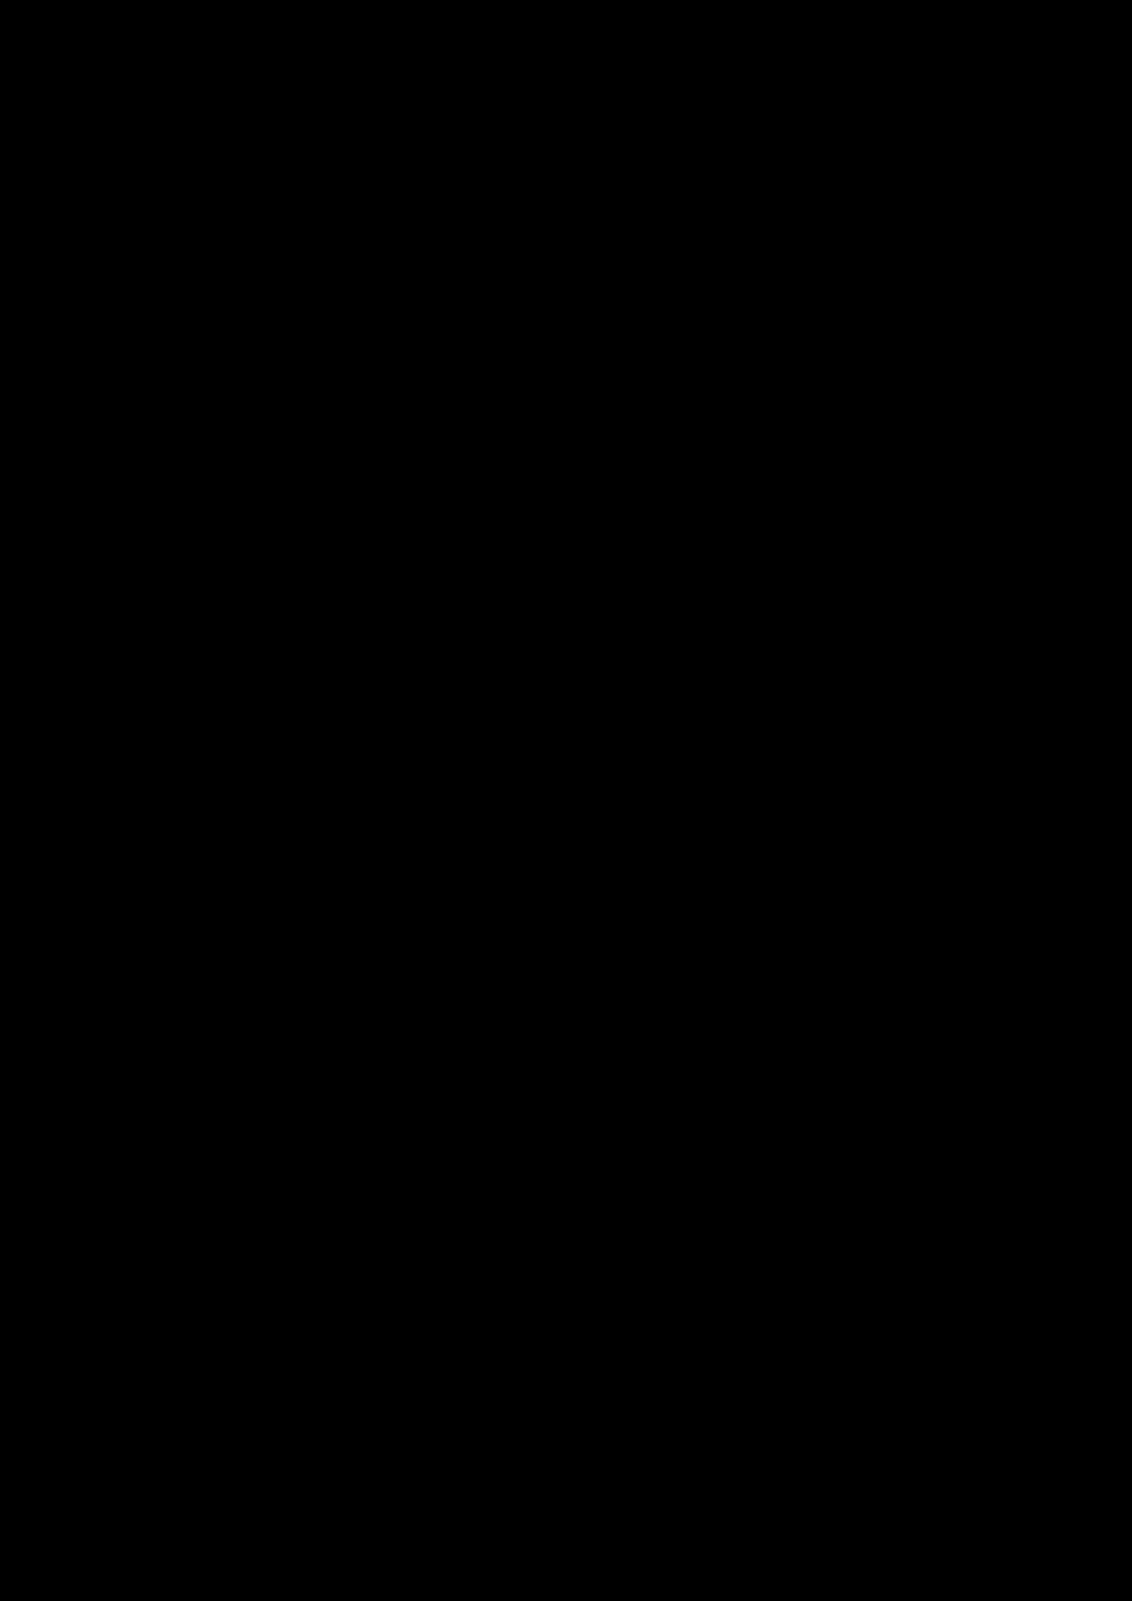 Korolevstvo slez slide, Image 5